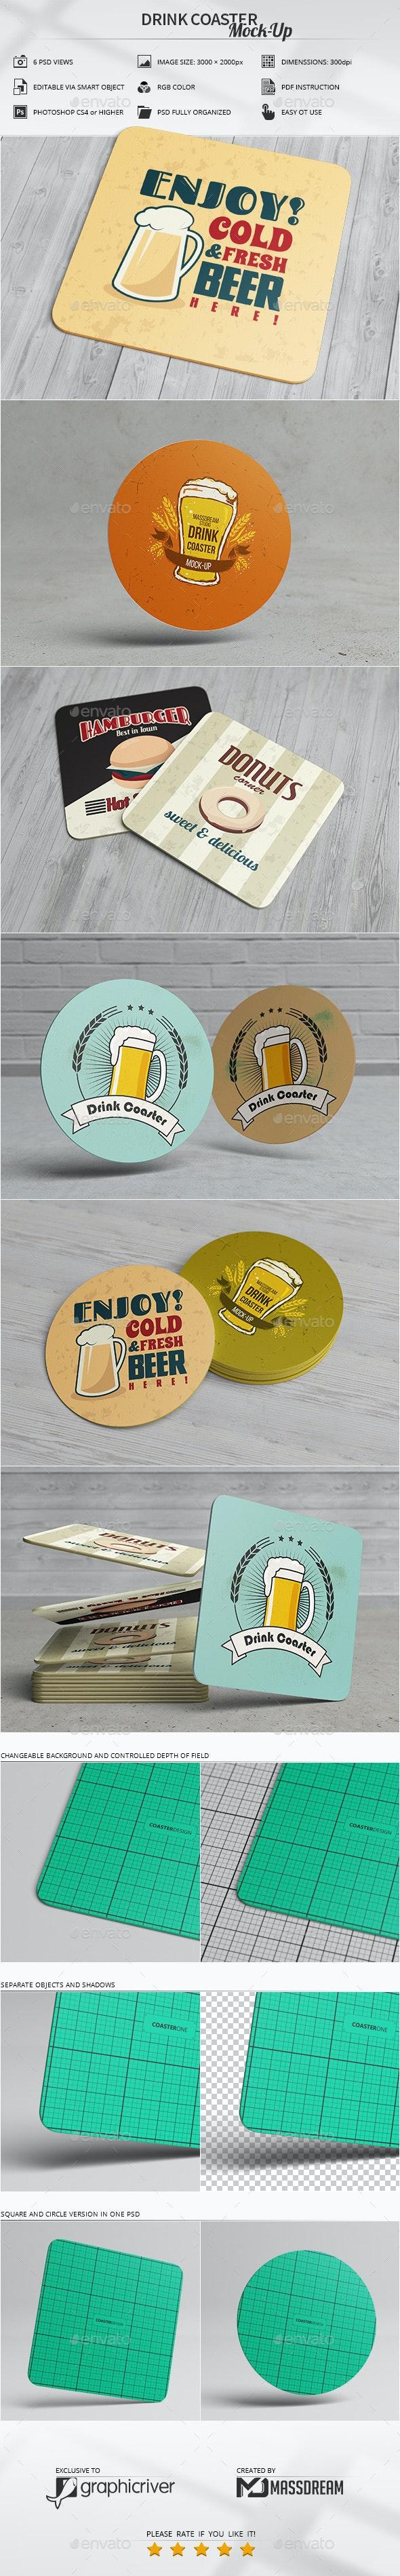 Drink Coaster Mock-Up - Product Mock-Ups Graphics